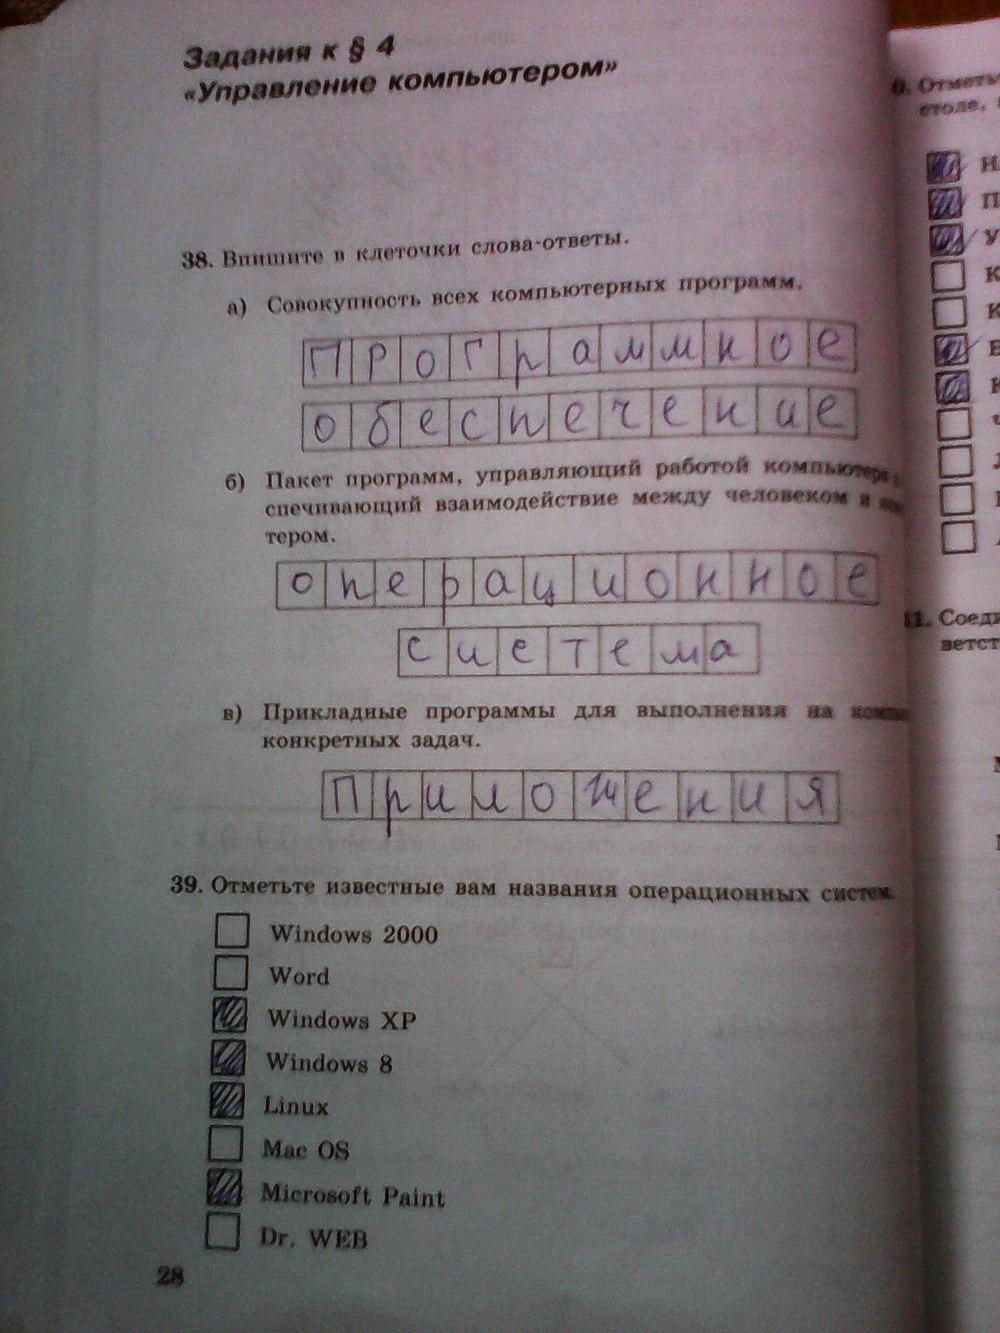 решебник по тетради 5 класс информатика